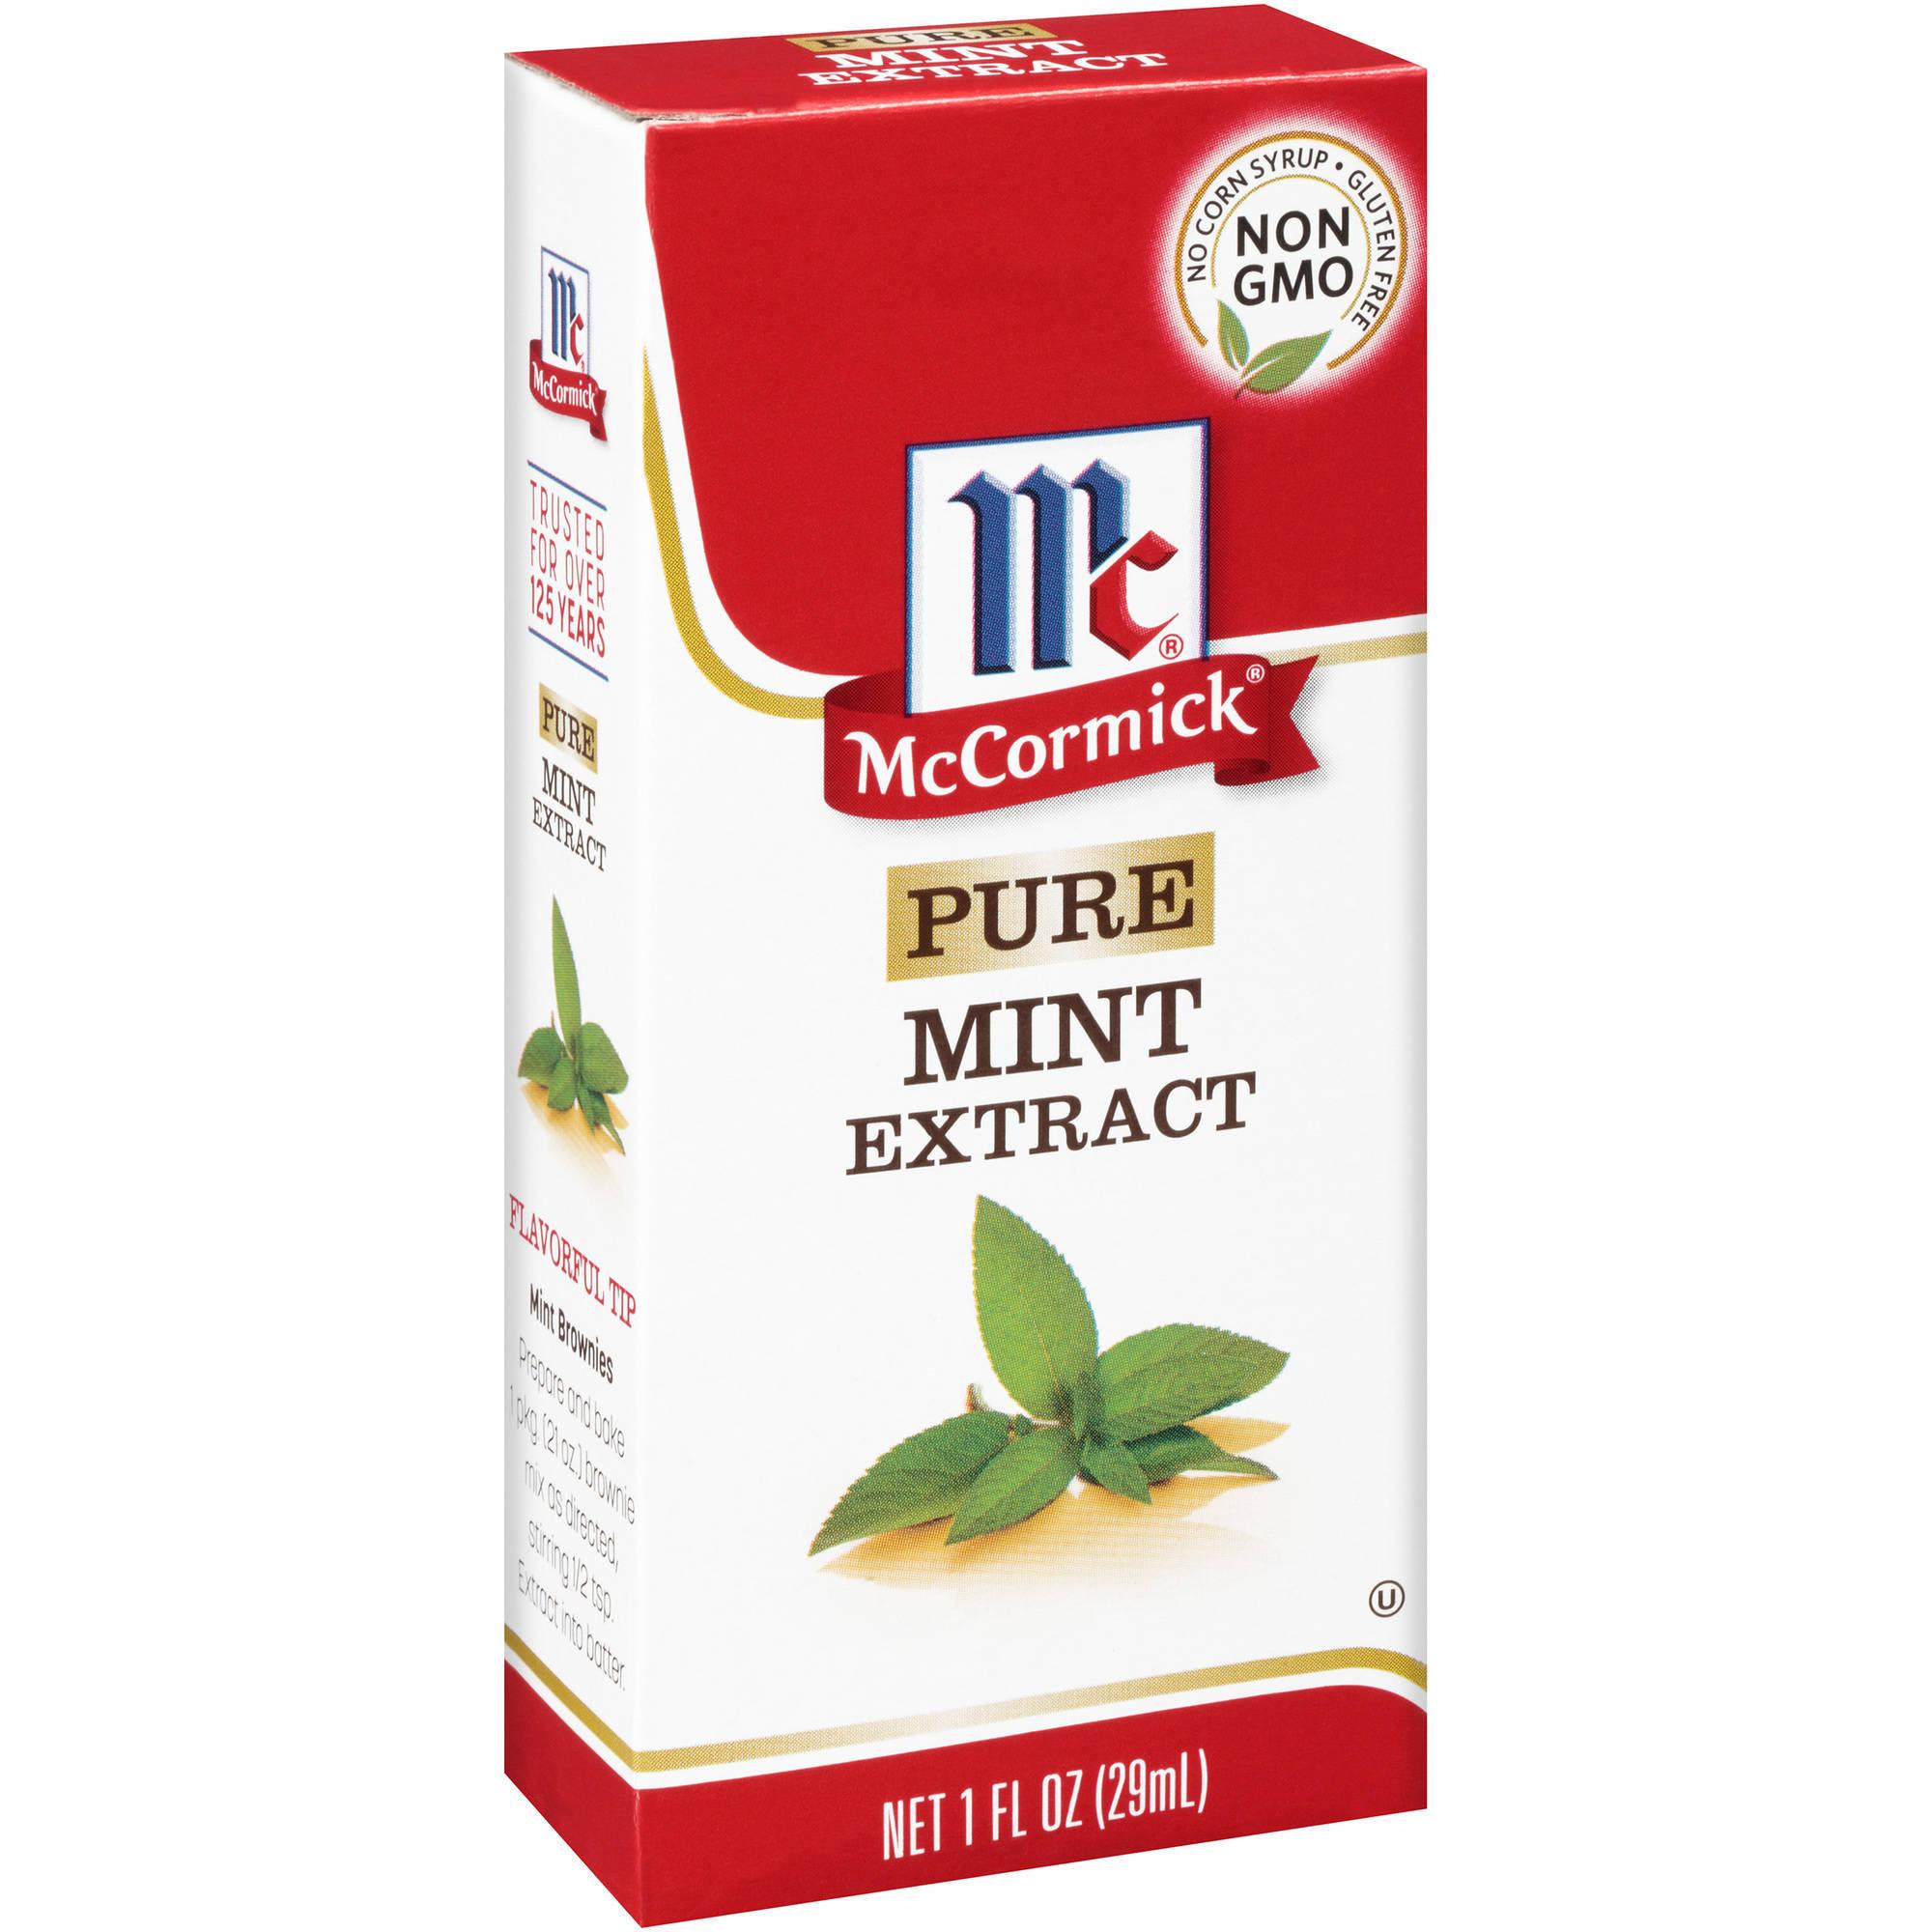 McCormick Pure Mint Extract, 1 fl oz